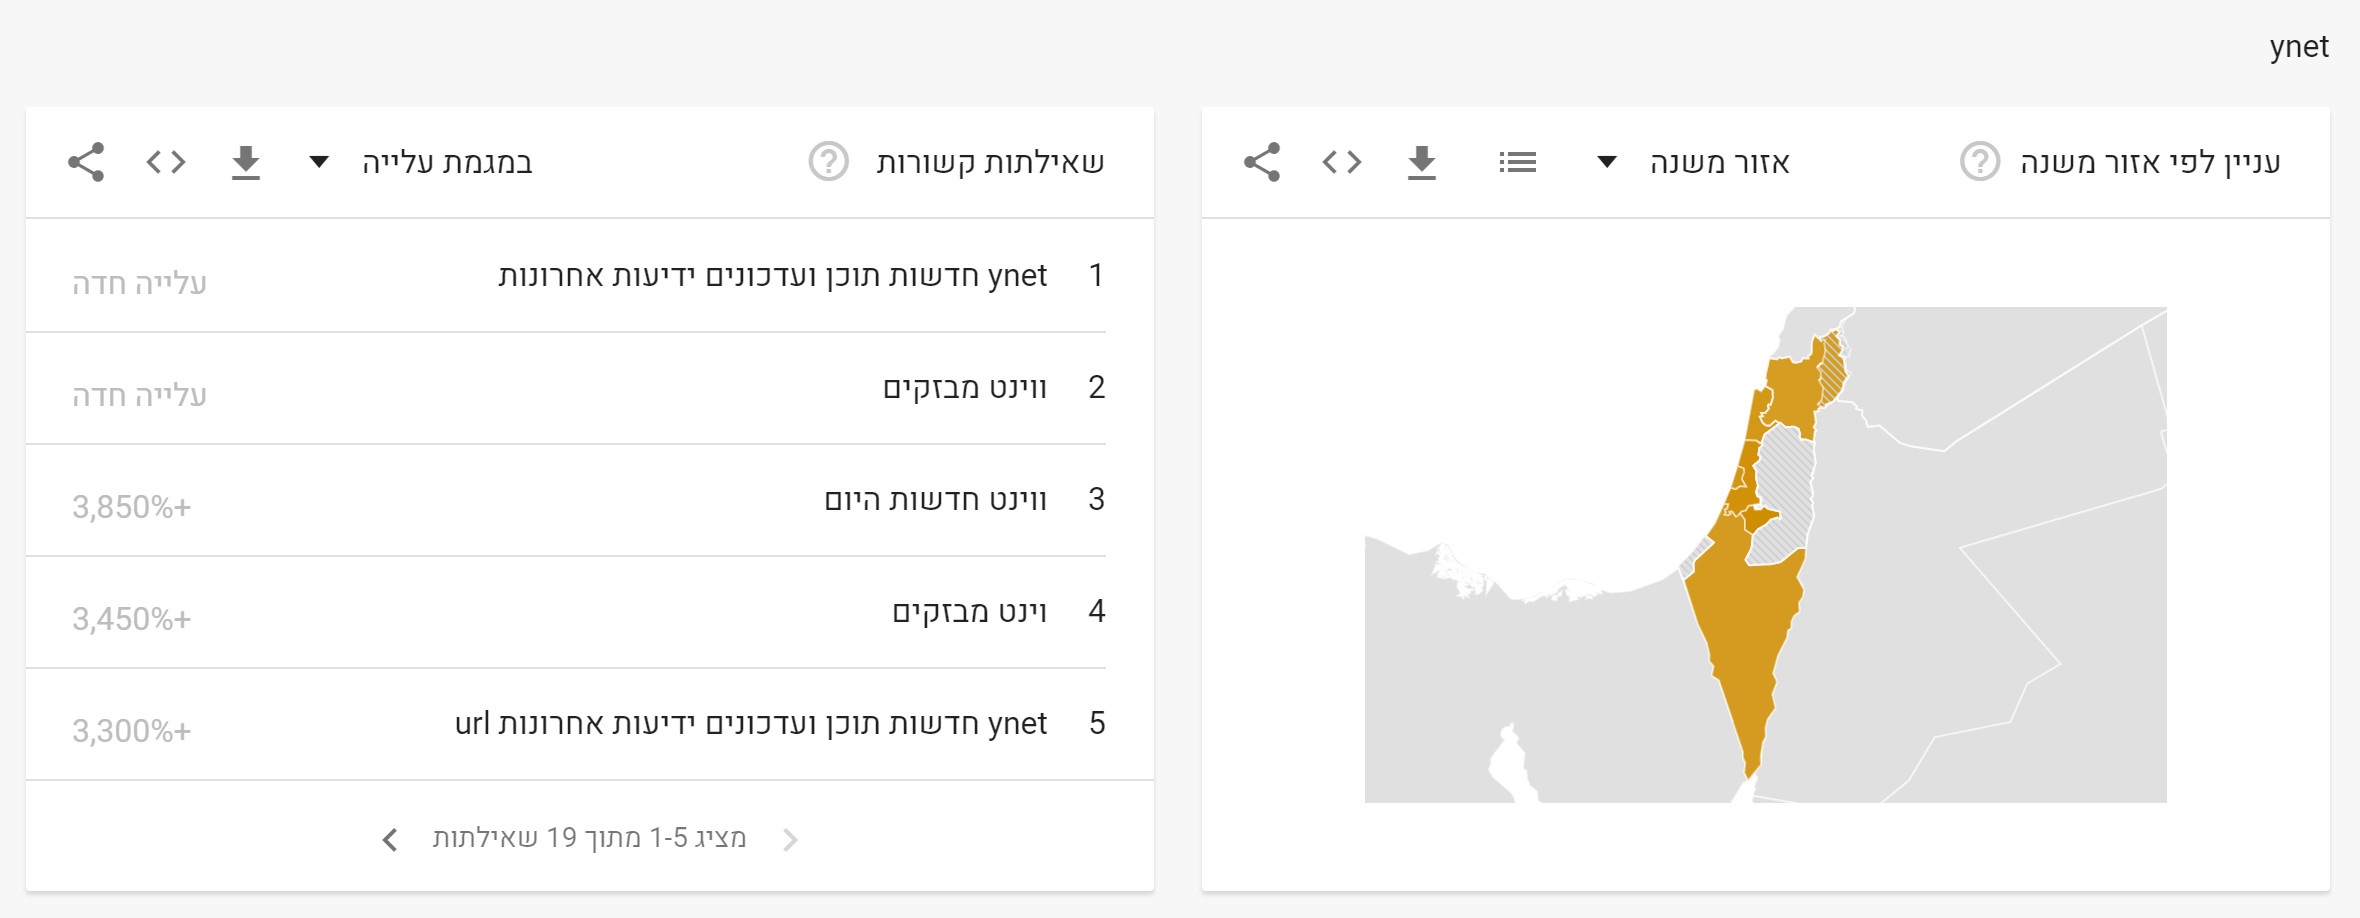 News in Google - Decade (6)